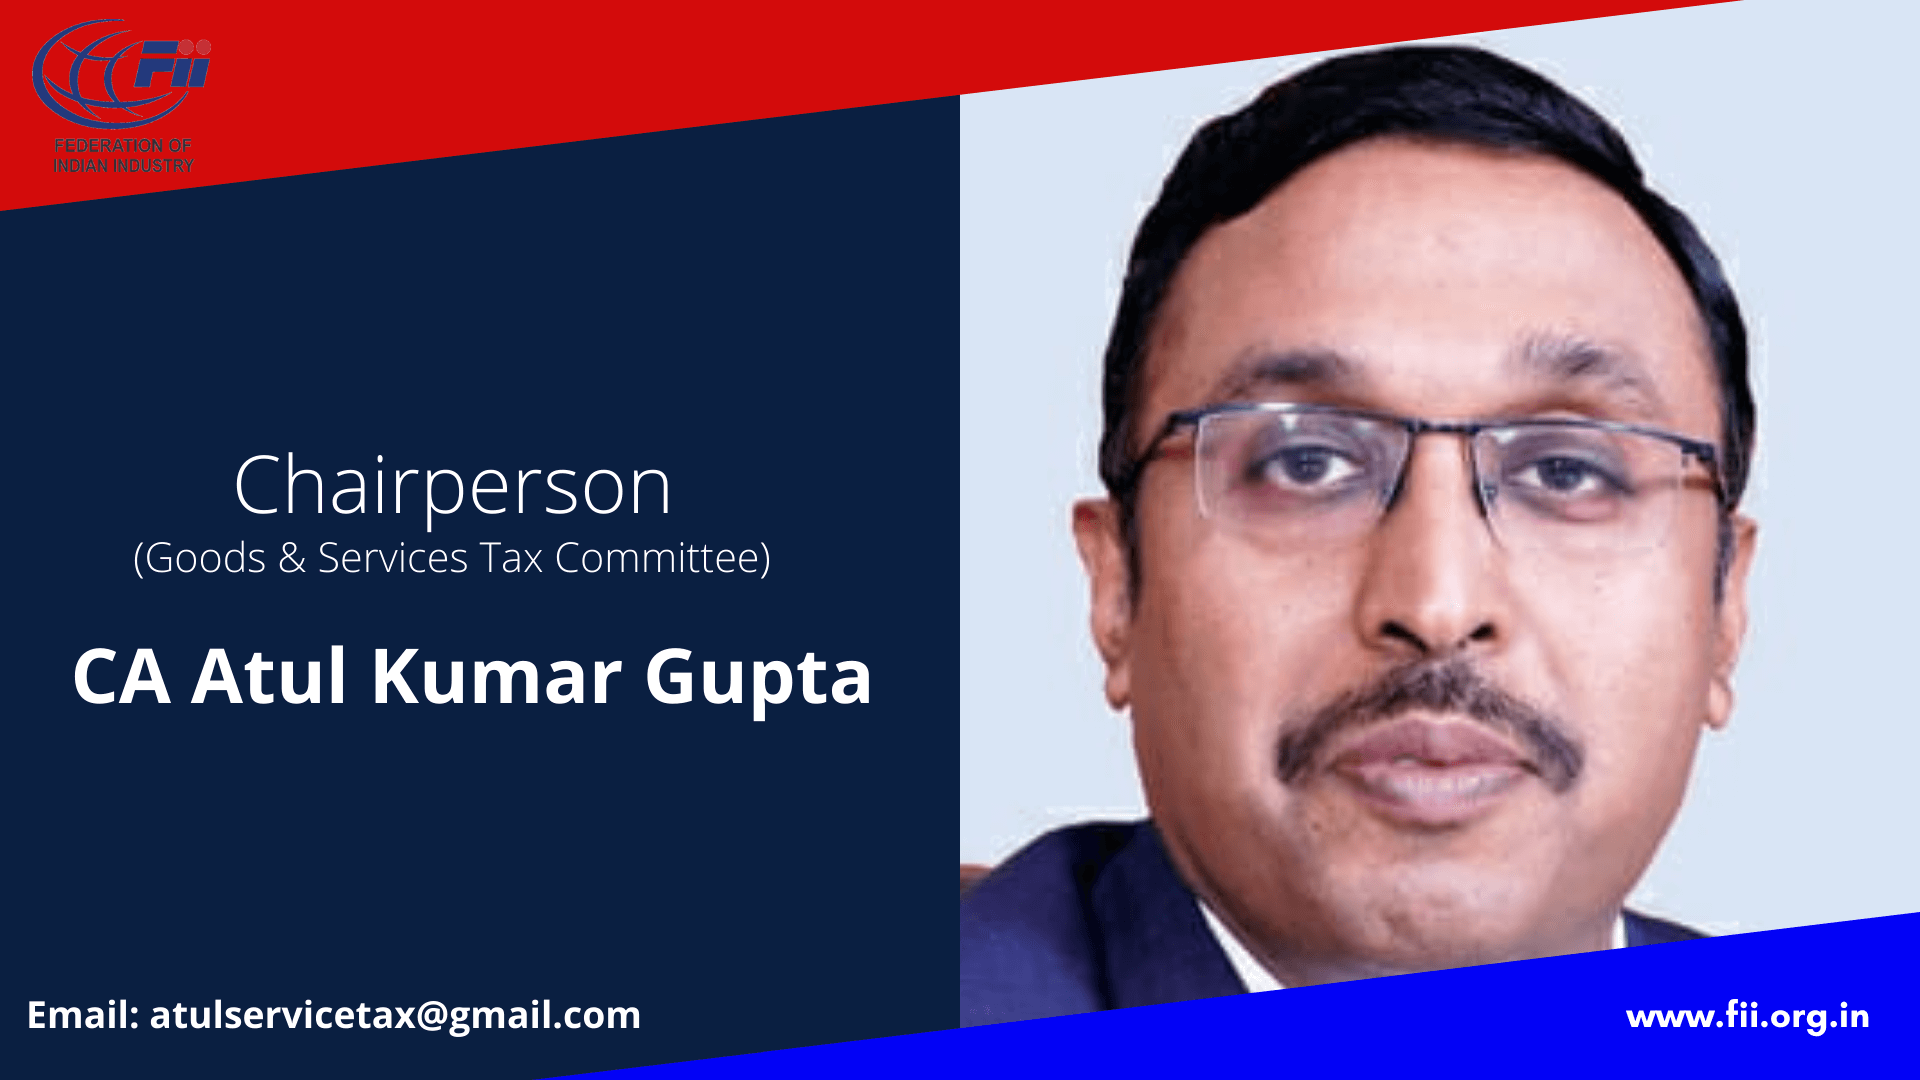 CA Atul Kumar Gupta, Chairperson, Goods & Services Committee